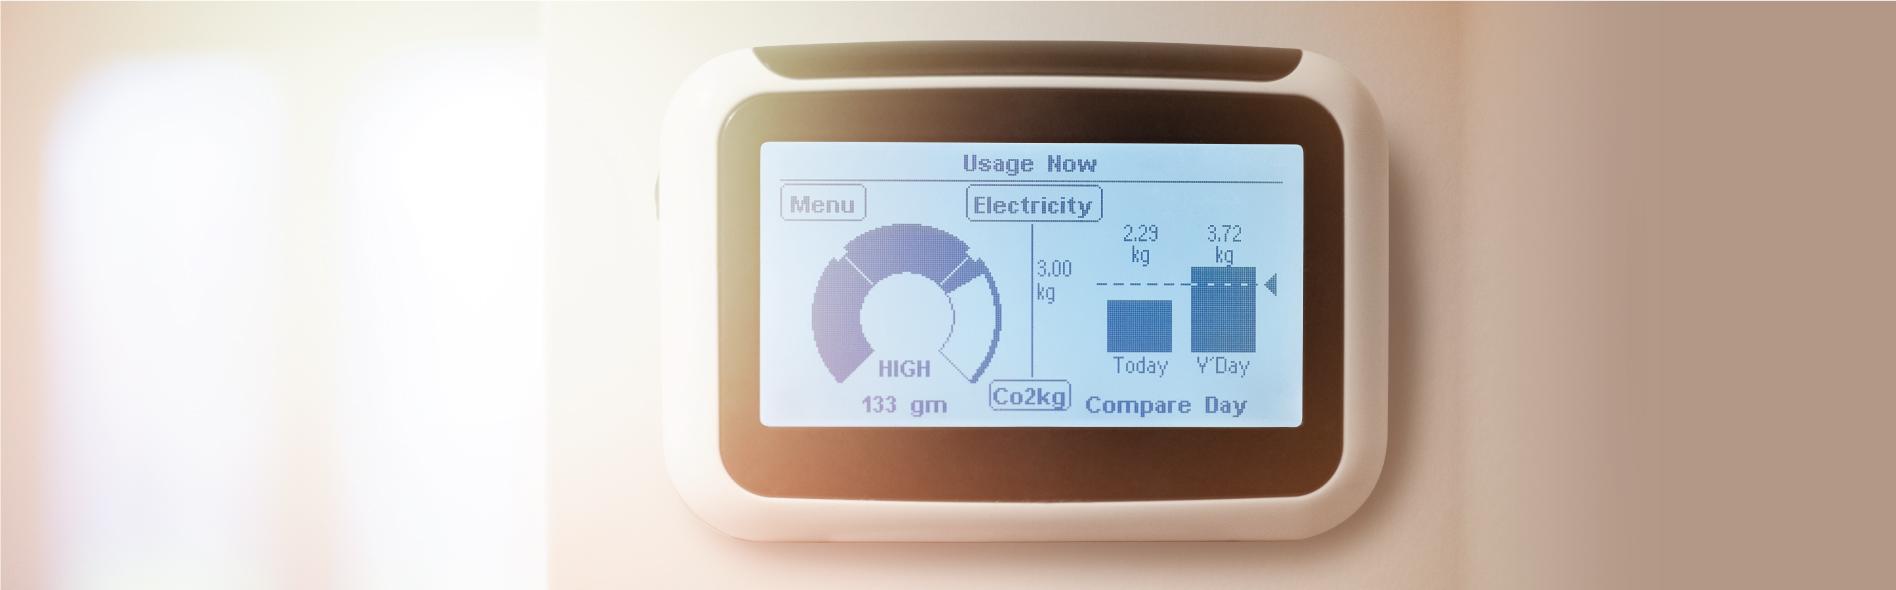 Utilities Digital Platform | Digital Utilities Transformation - Wipro